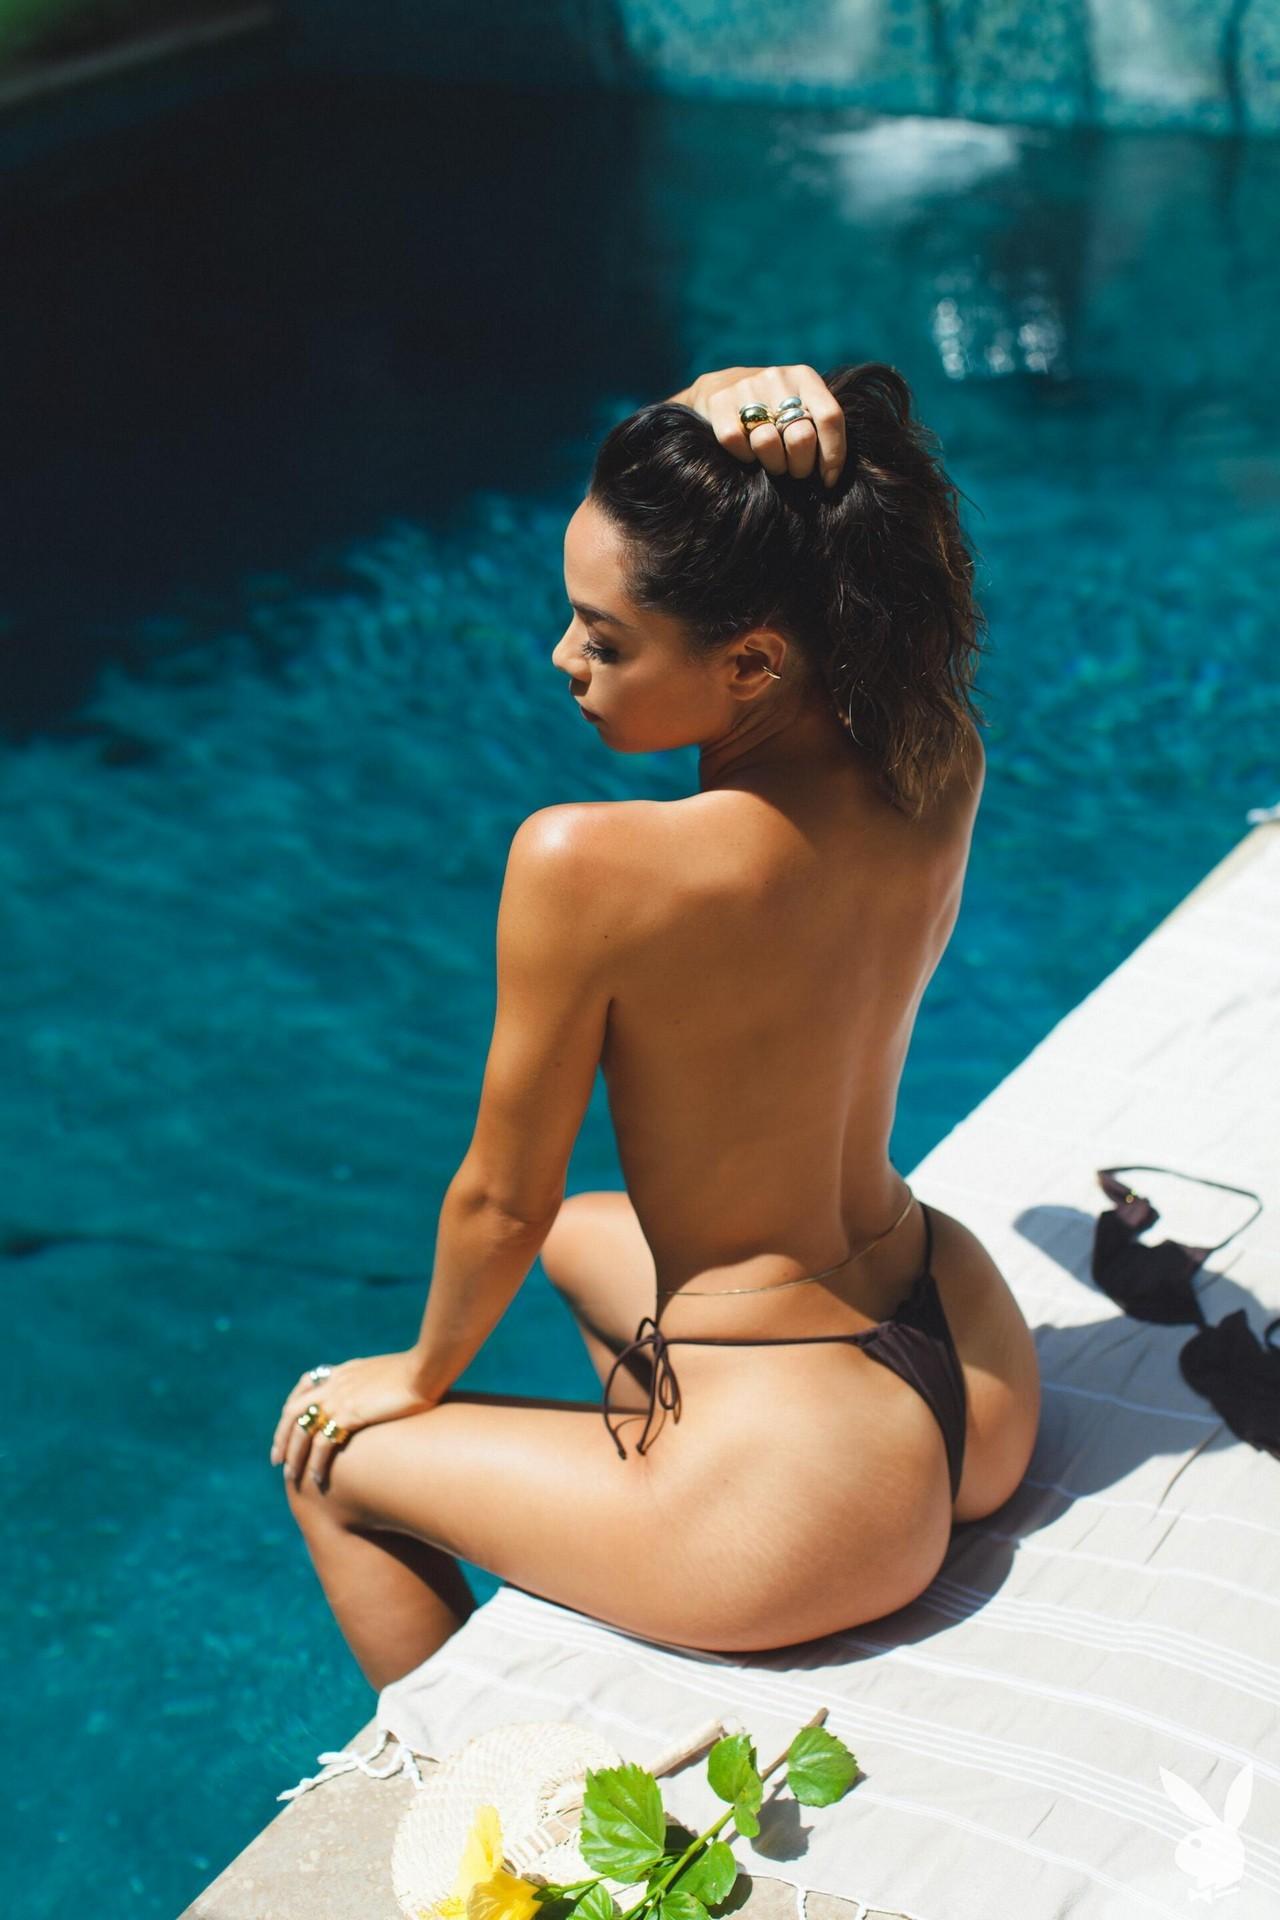 Danielle Alcaraz Playmate Outtakes Playboy Plus (4)